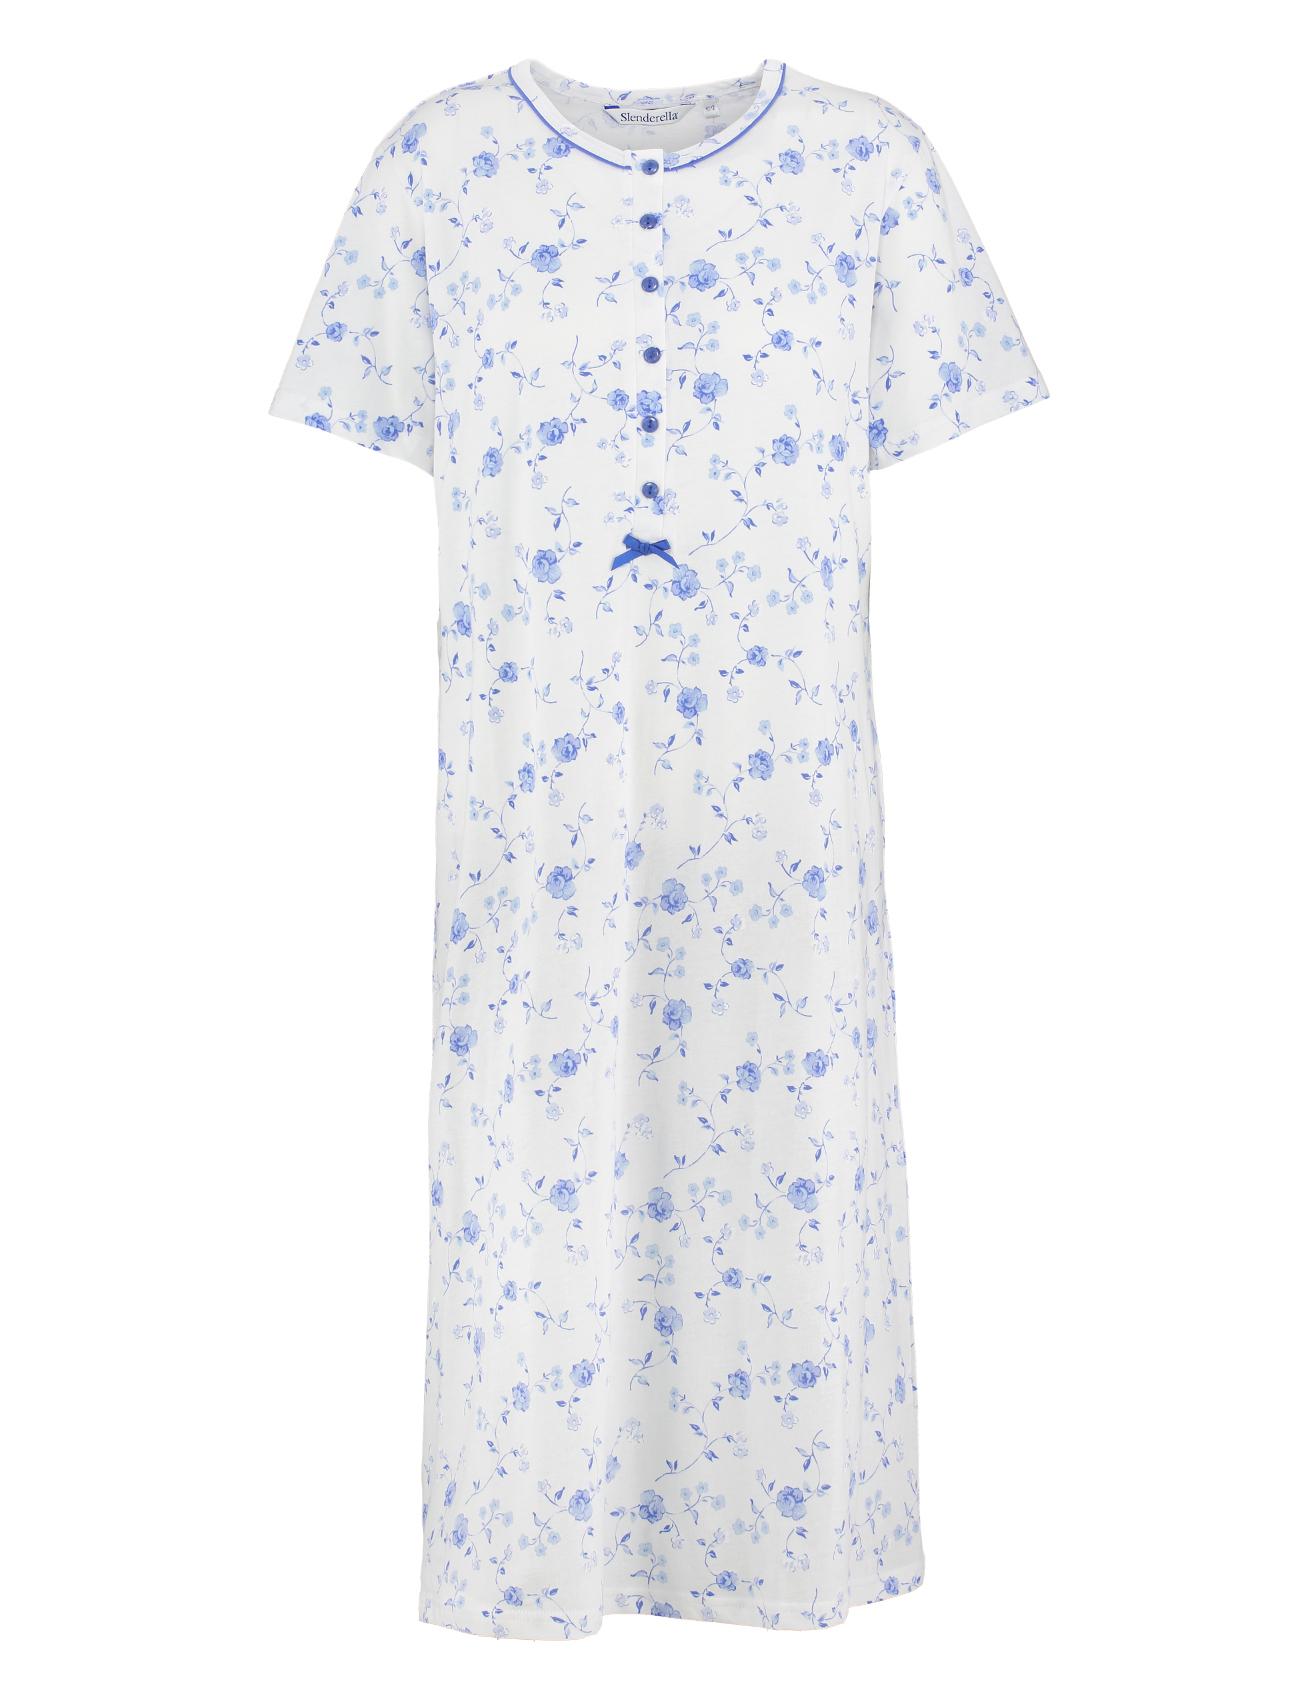 Black t shirt nightdress - Ladies Slenderella Jersey Cotton Floral Nightdress Short Sleeve